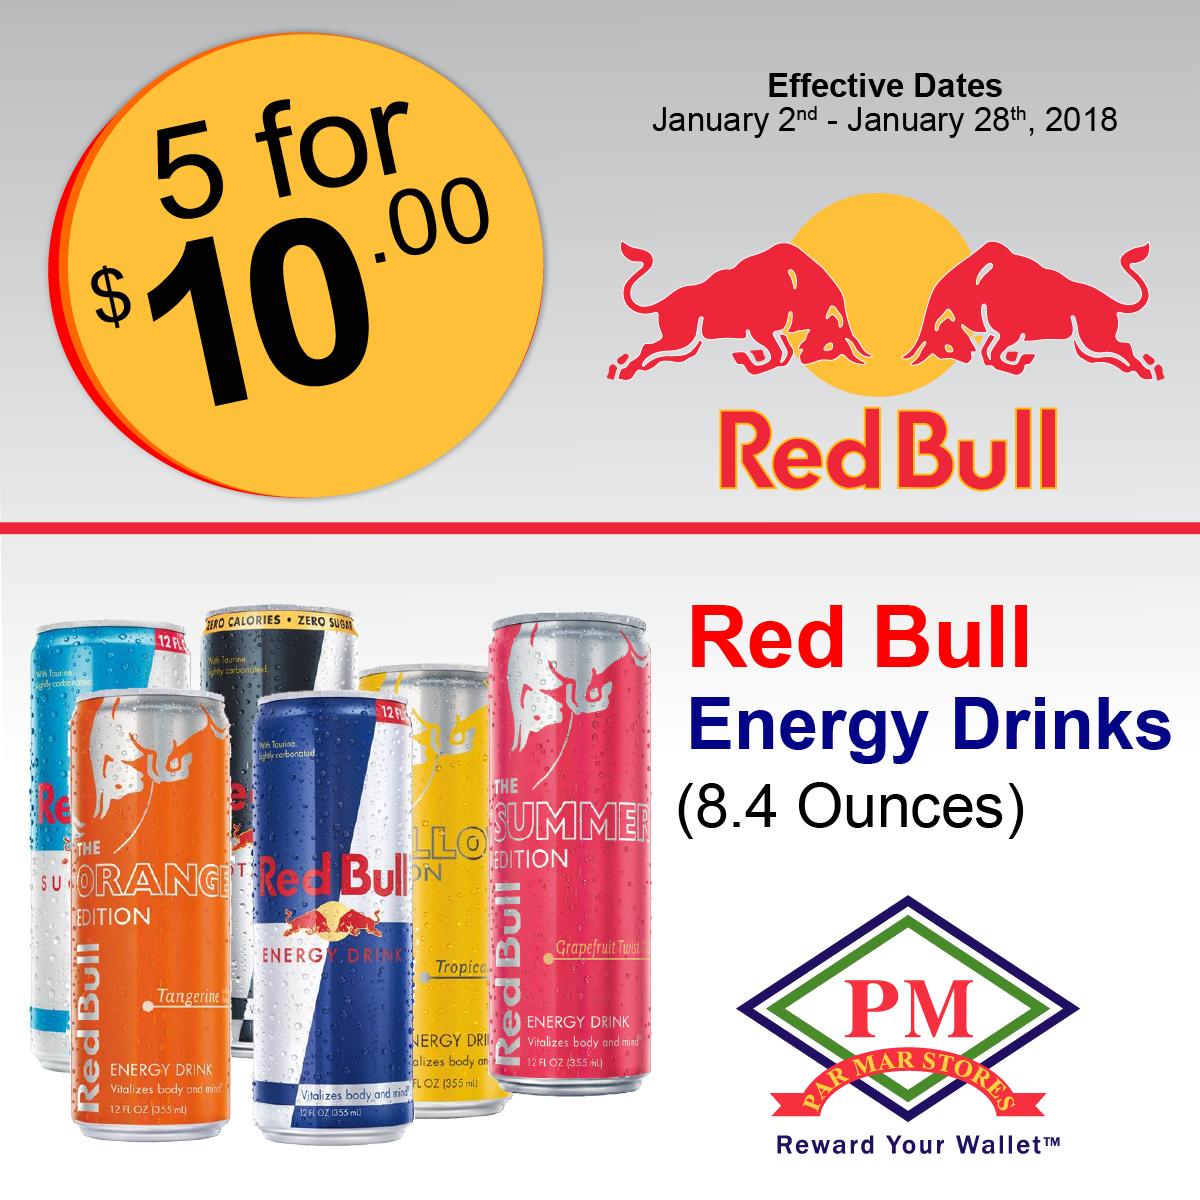 Red Bull Promo2